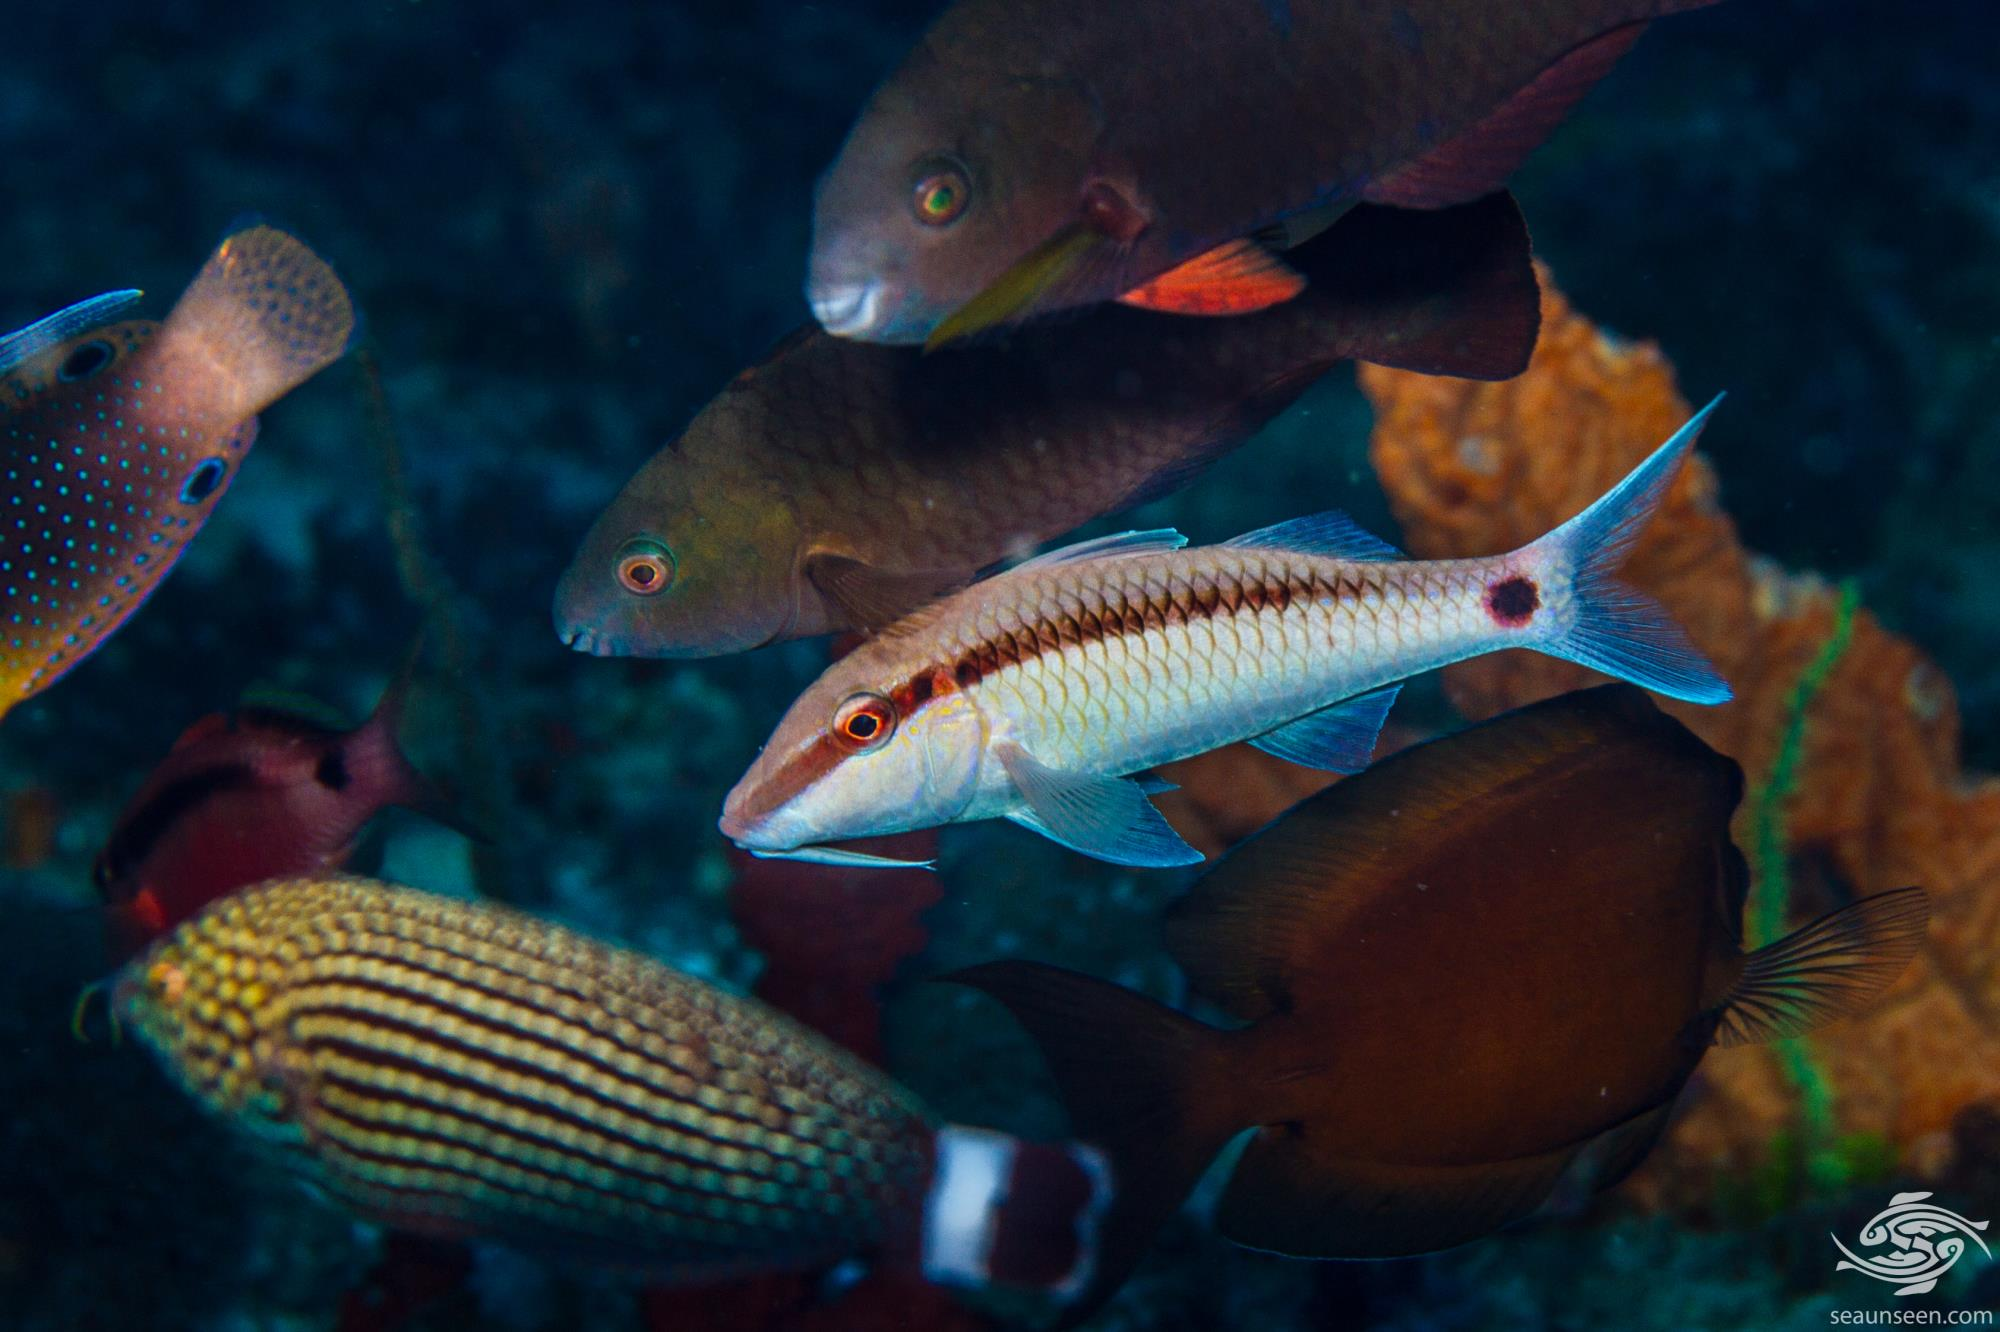 Dash-and-Dot goatfish (Parupeneus barberinus) is also known as the  Dash dot Goatfish.